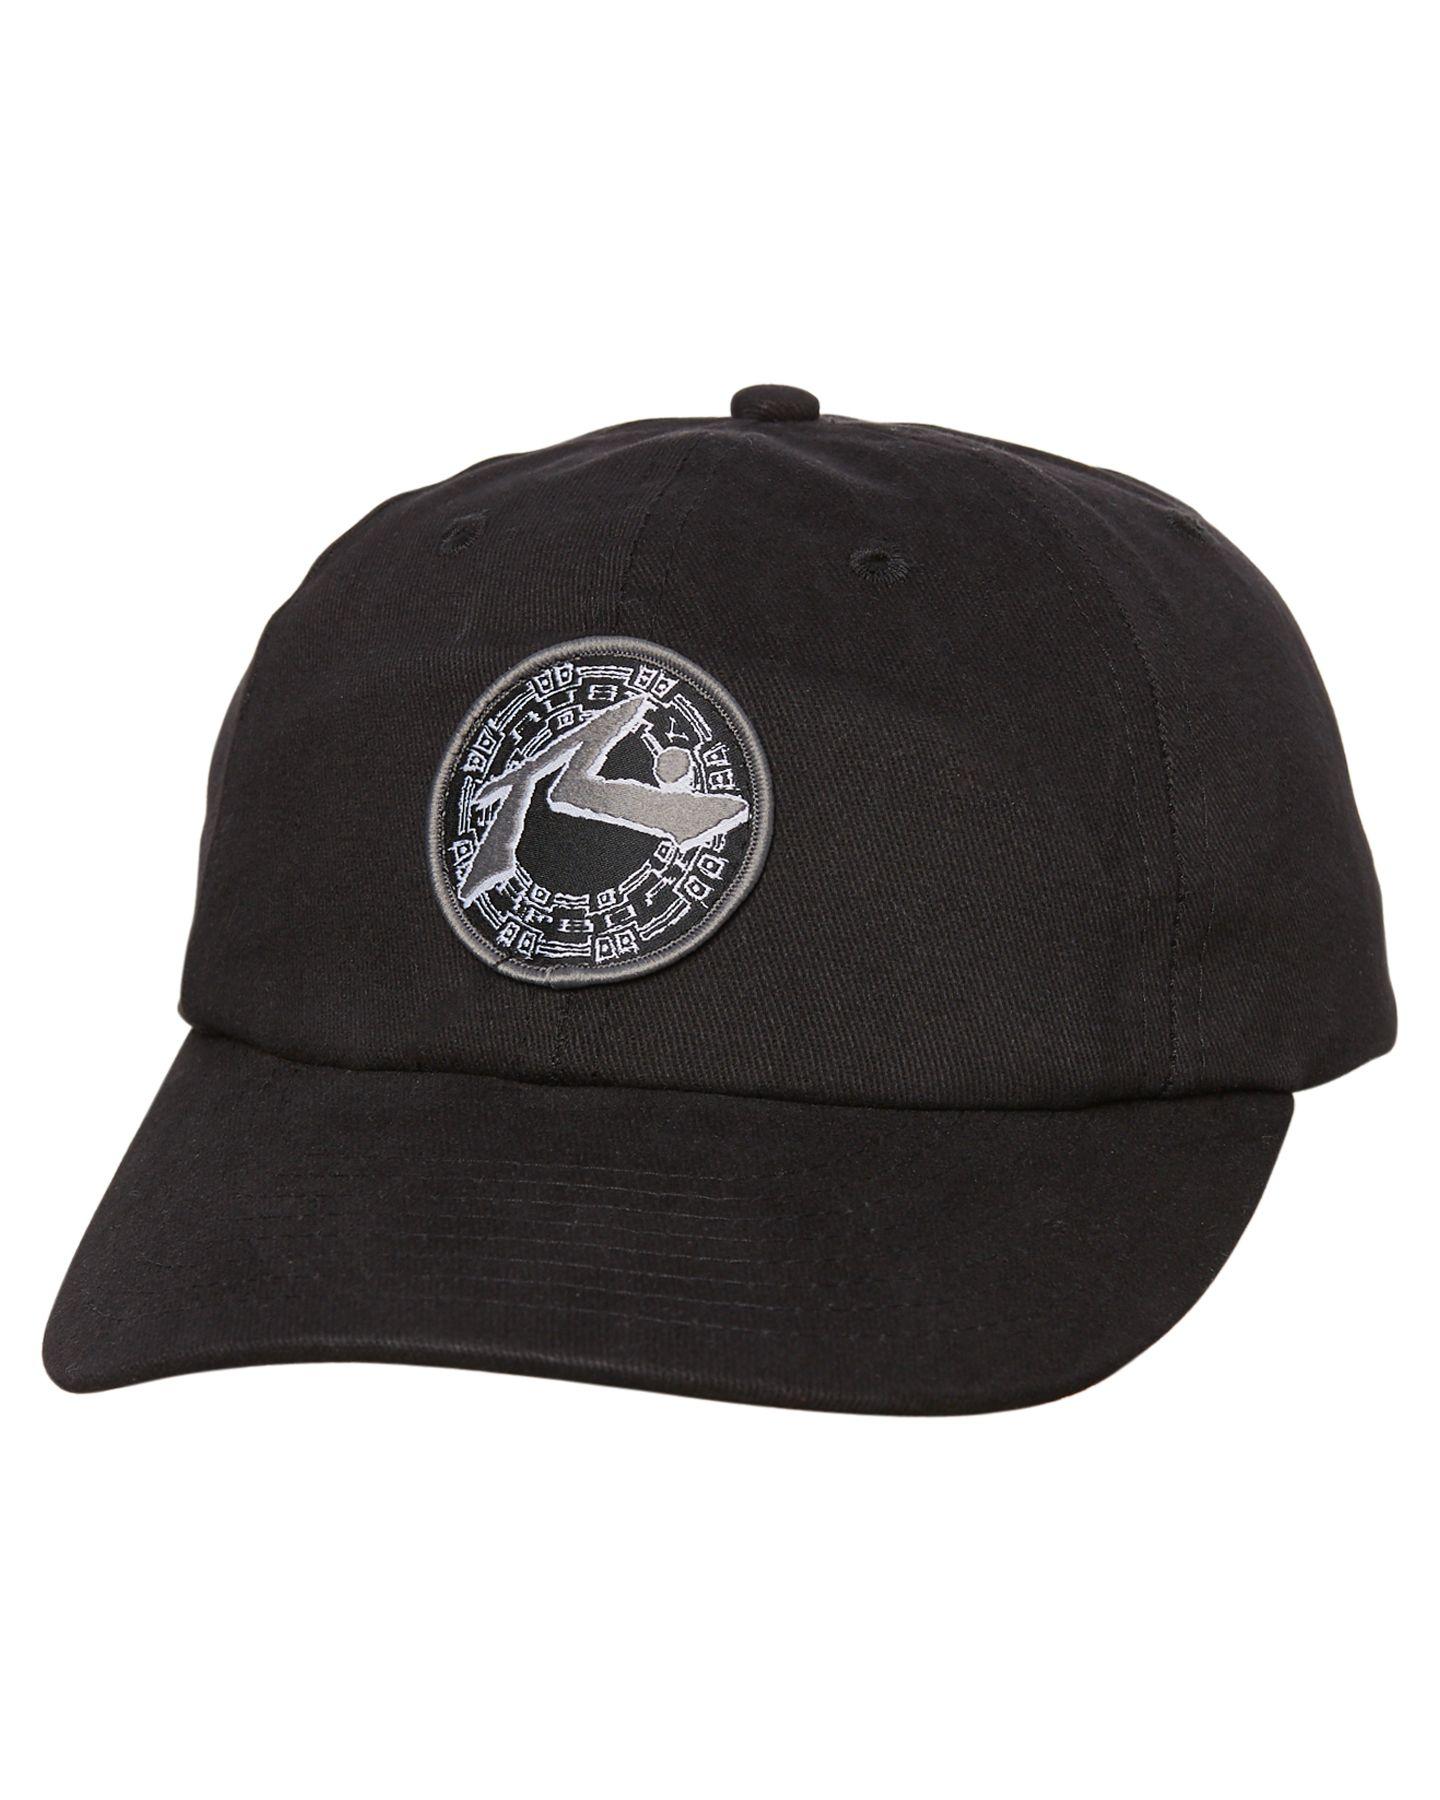 0dc8874e9e8 Rusty Mayan 4 Adjustable Cap Black - Fashion Shop